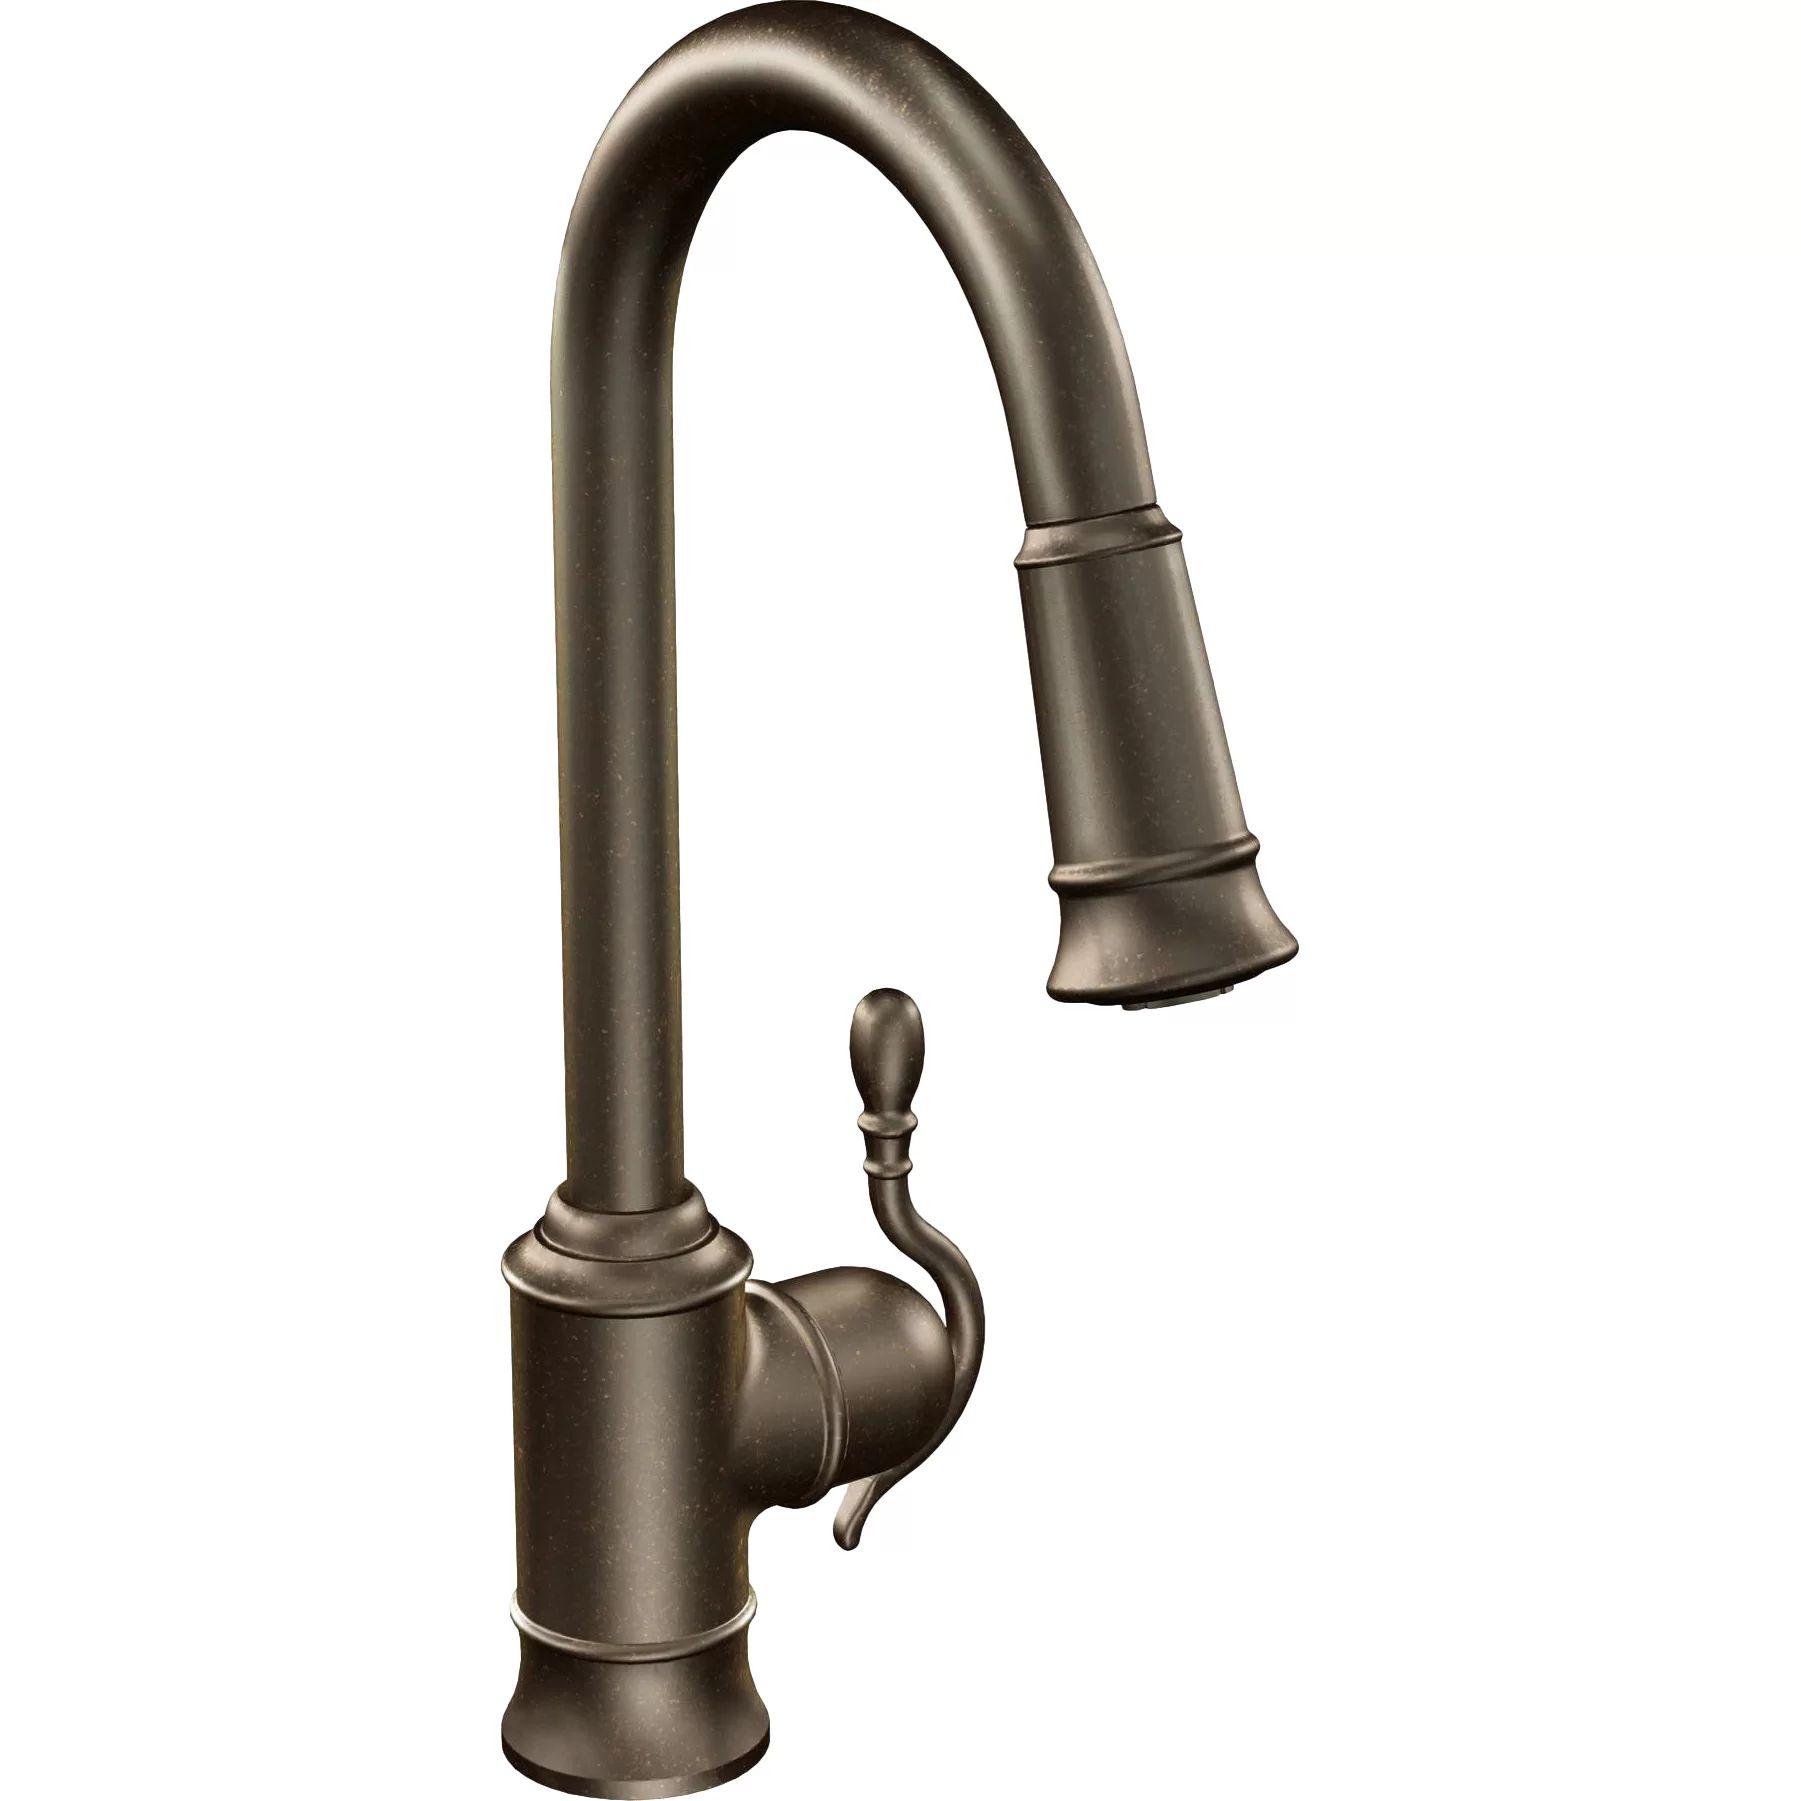 Moen woodmere single handle single hole kitchen faucet